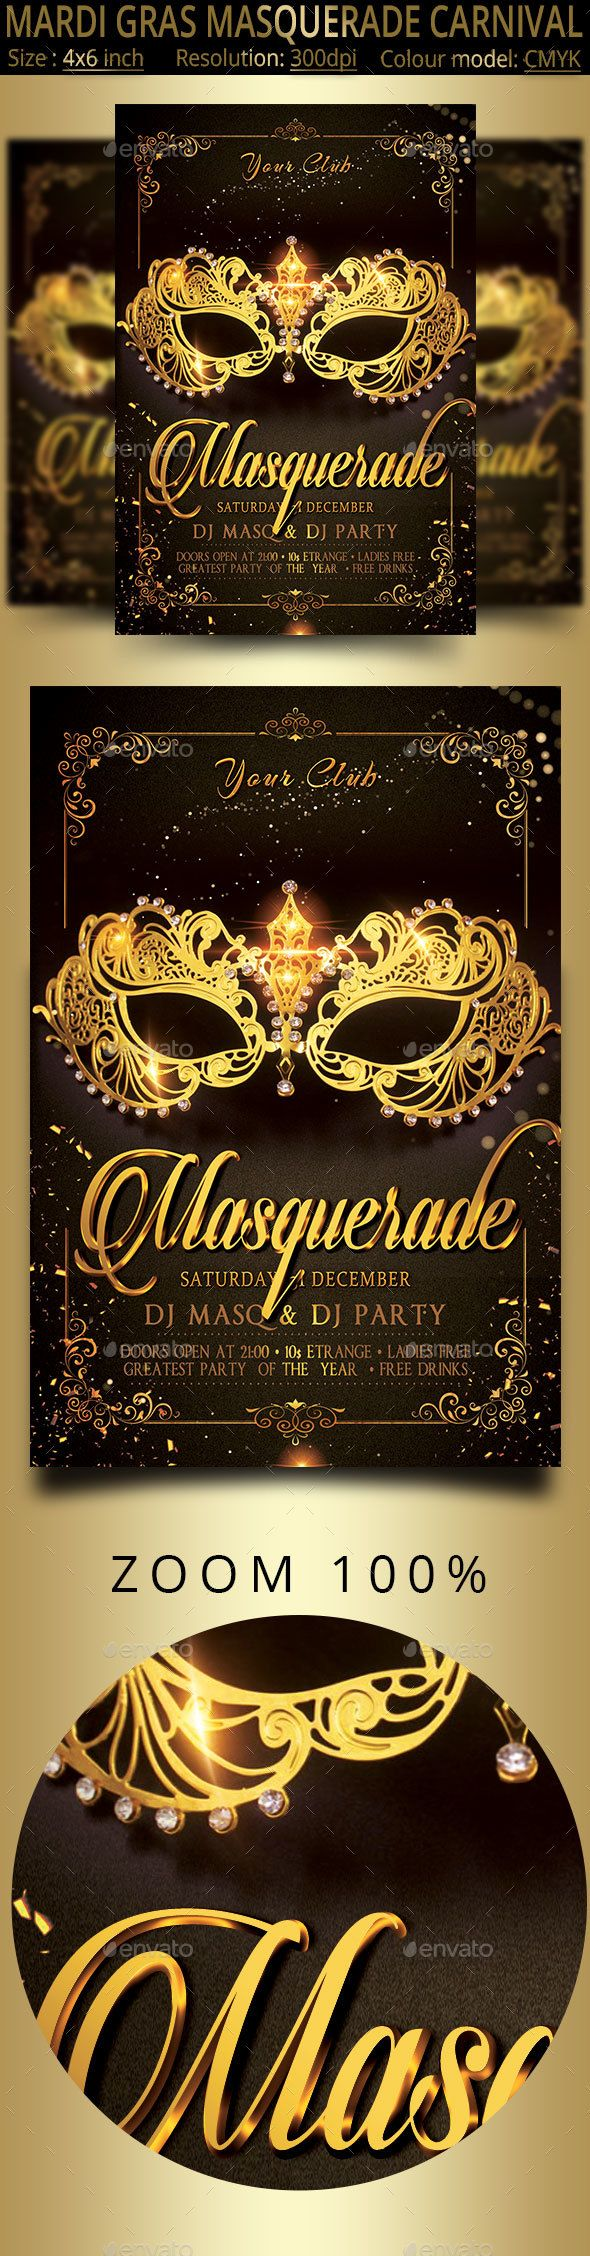 Masquerade Mardi Gras Carnival Party Flyer   #brasil, #brasileiro, #brazil, #brazilian, #carnaval, #carnival, #carnival party, #celebration, #club, #Costumes, #event, #fat Tuesday, #festa, #festival, #flyer, #latin, #mardi, #mardi gras, #mardi gras flyer, #mardigras, #mask, #masks, #masquerade, #Masquerade Ball, #party, #poster, #psd, #rio de janeiro, #samba, #template